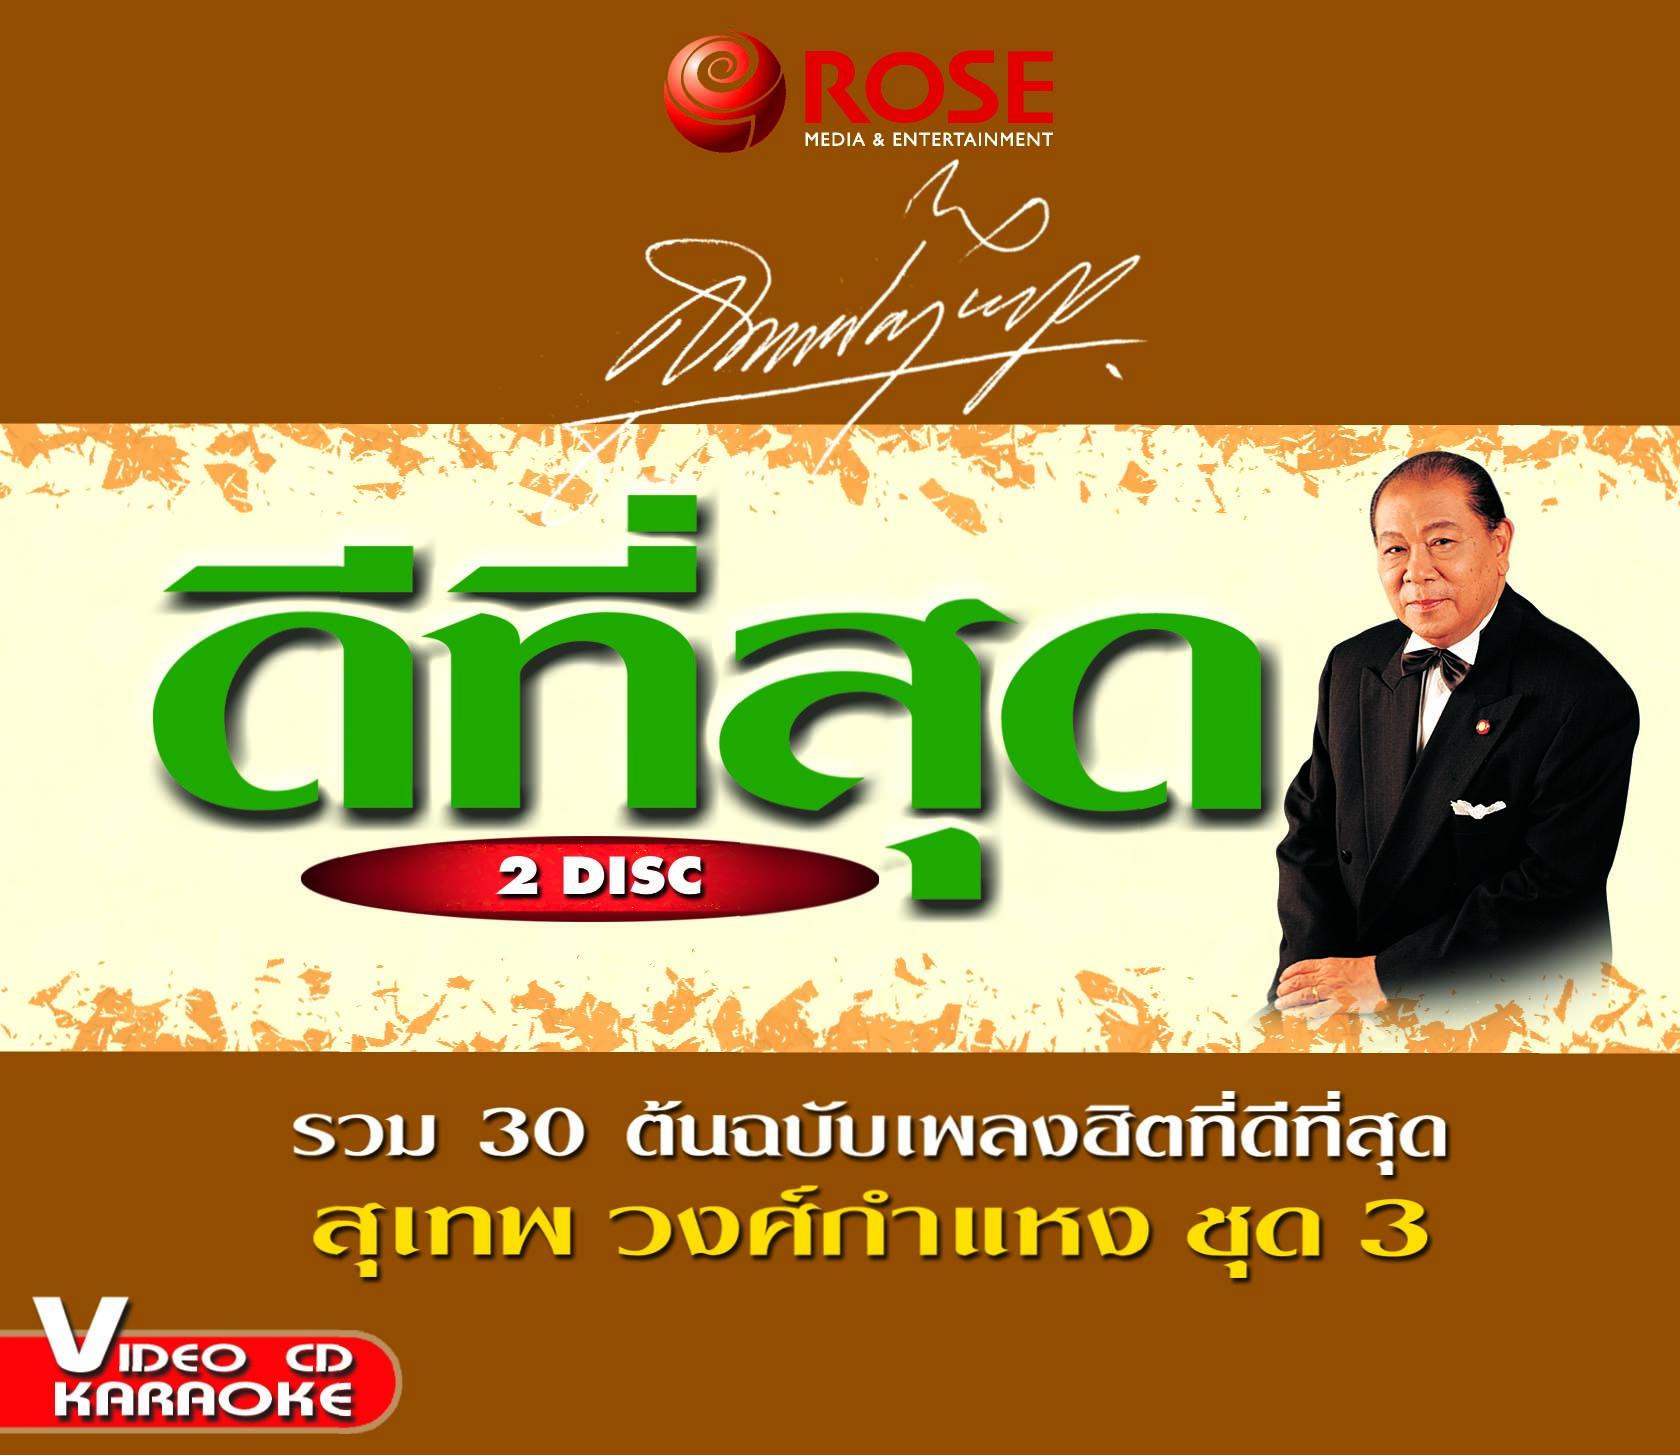 VCDดีที่สุด สุเทพ วงศ์กำแหง ชุด 3